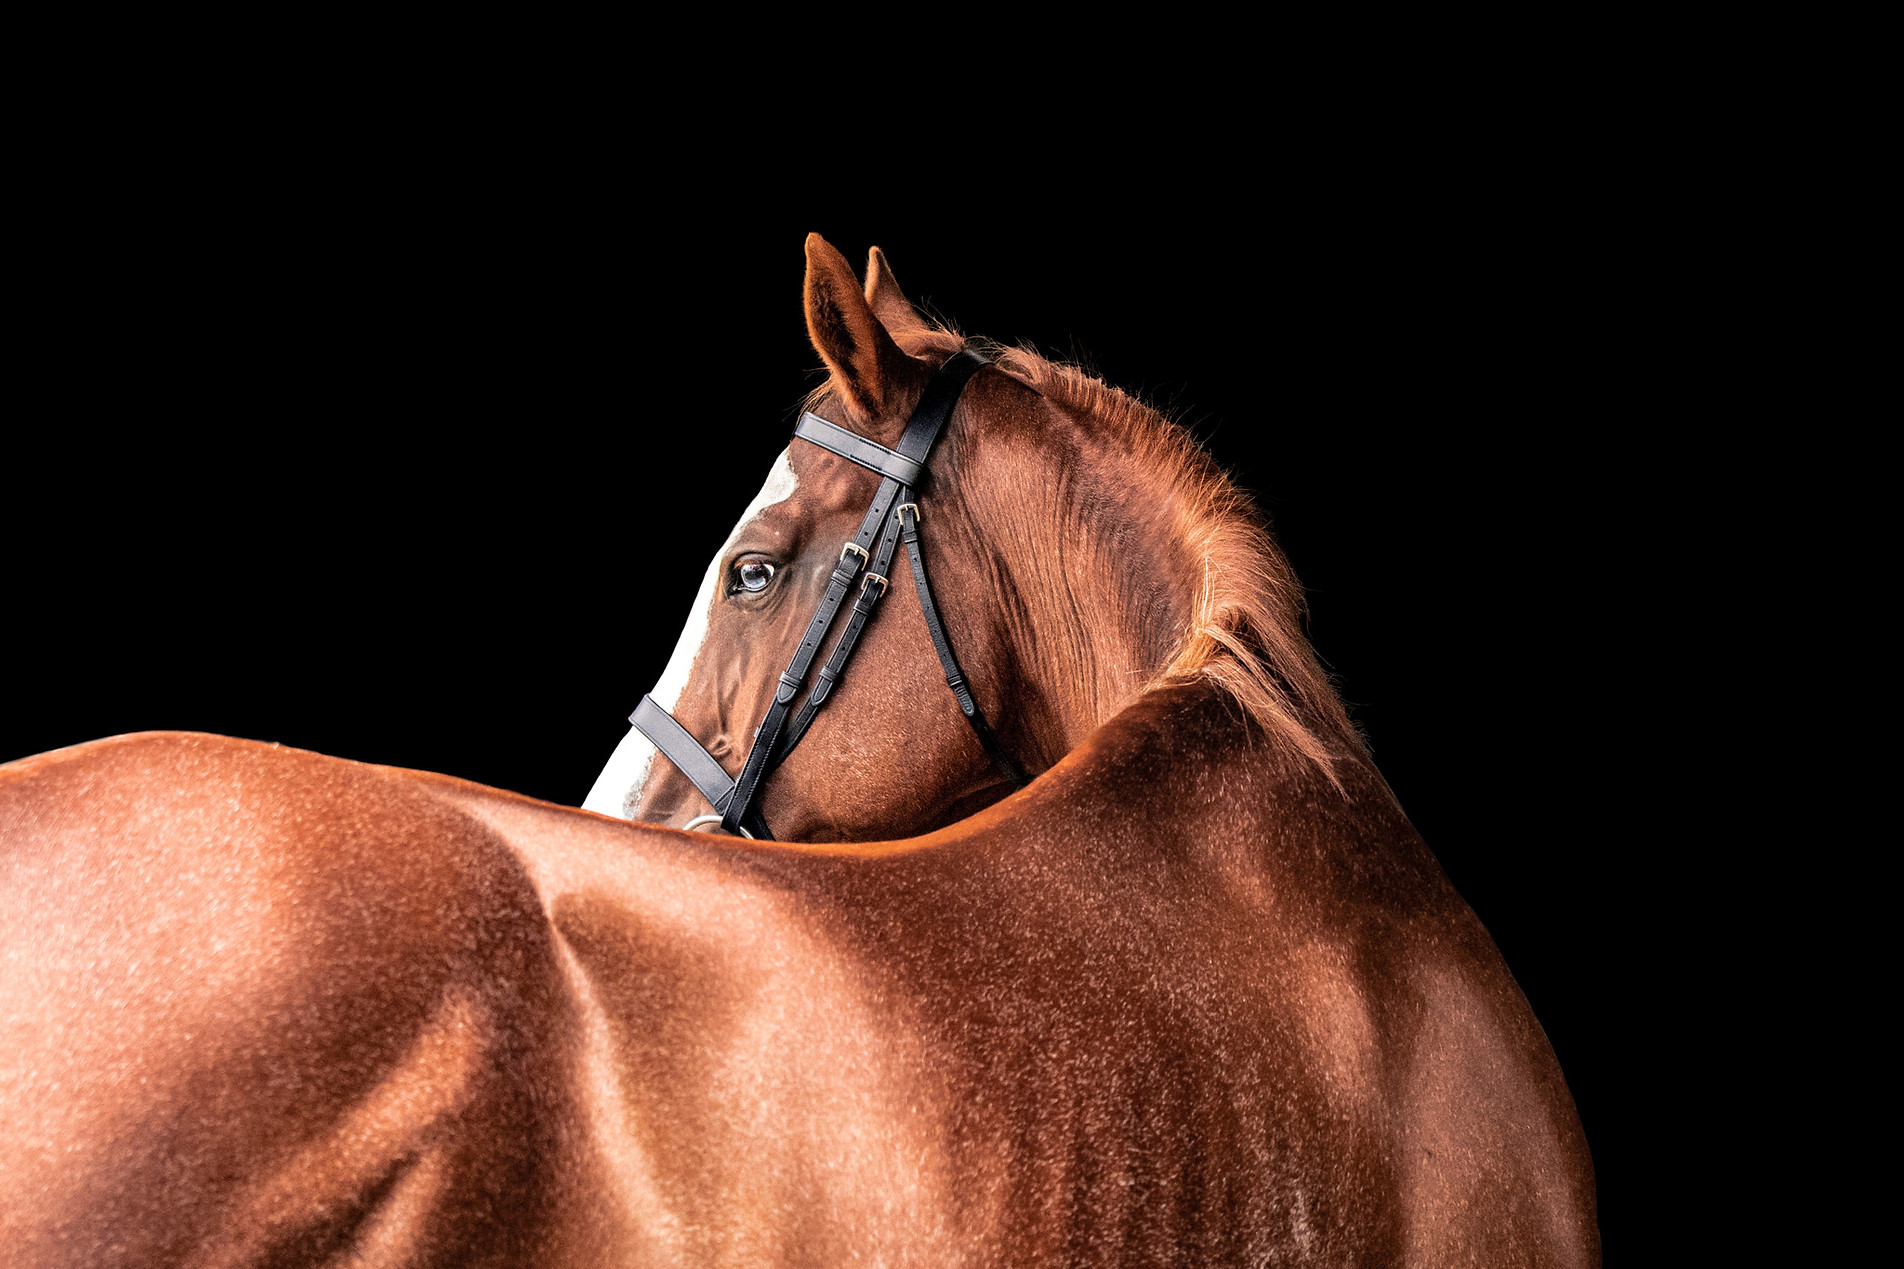 Equine Fine Art Sydney photography